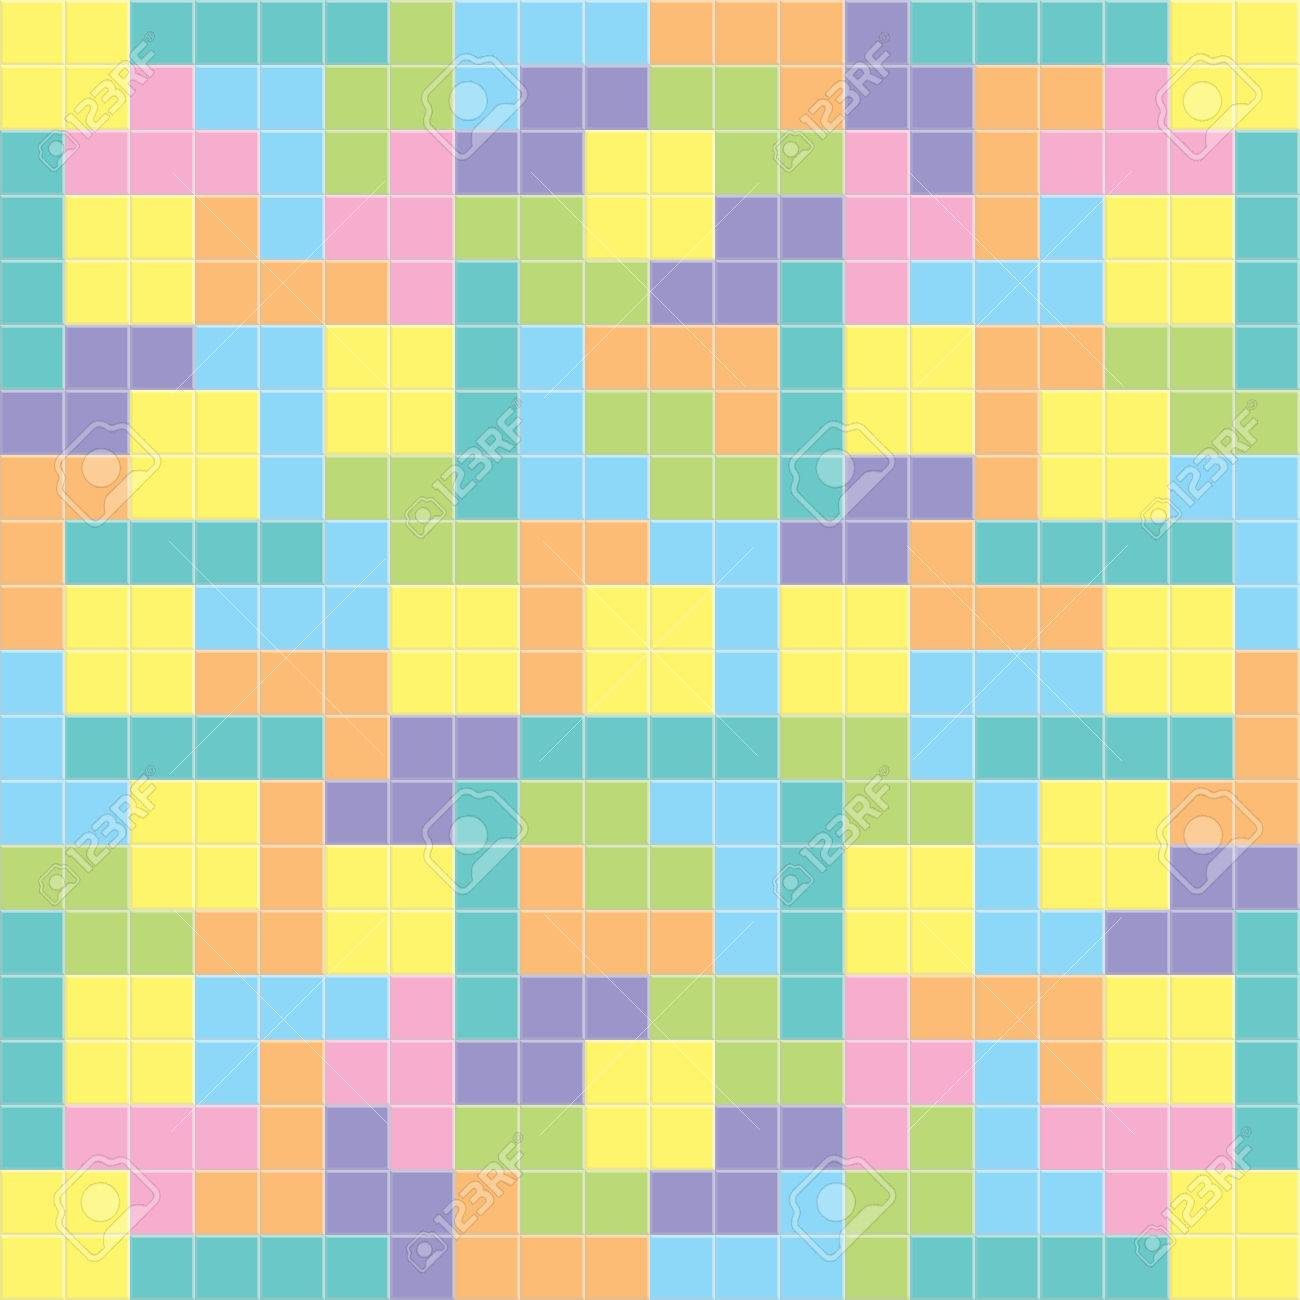 Tetris Background Pastel Colorsillustration Royalty Cliparts 1300x1300